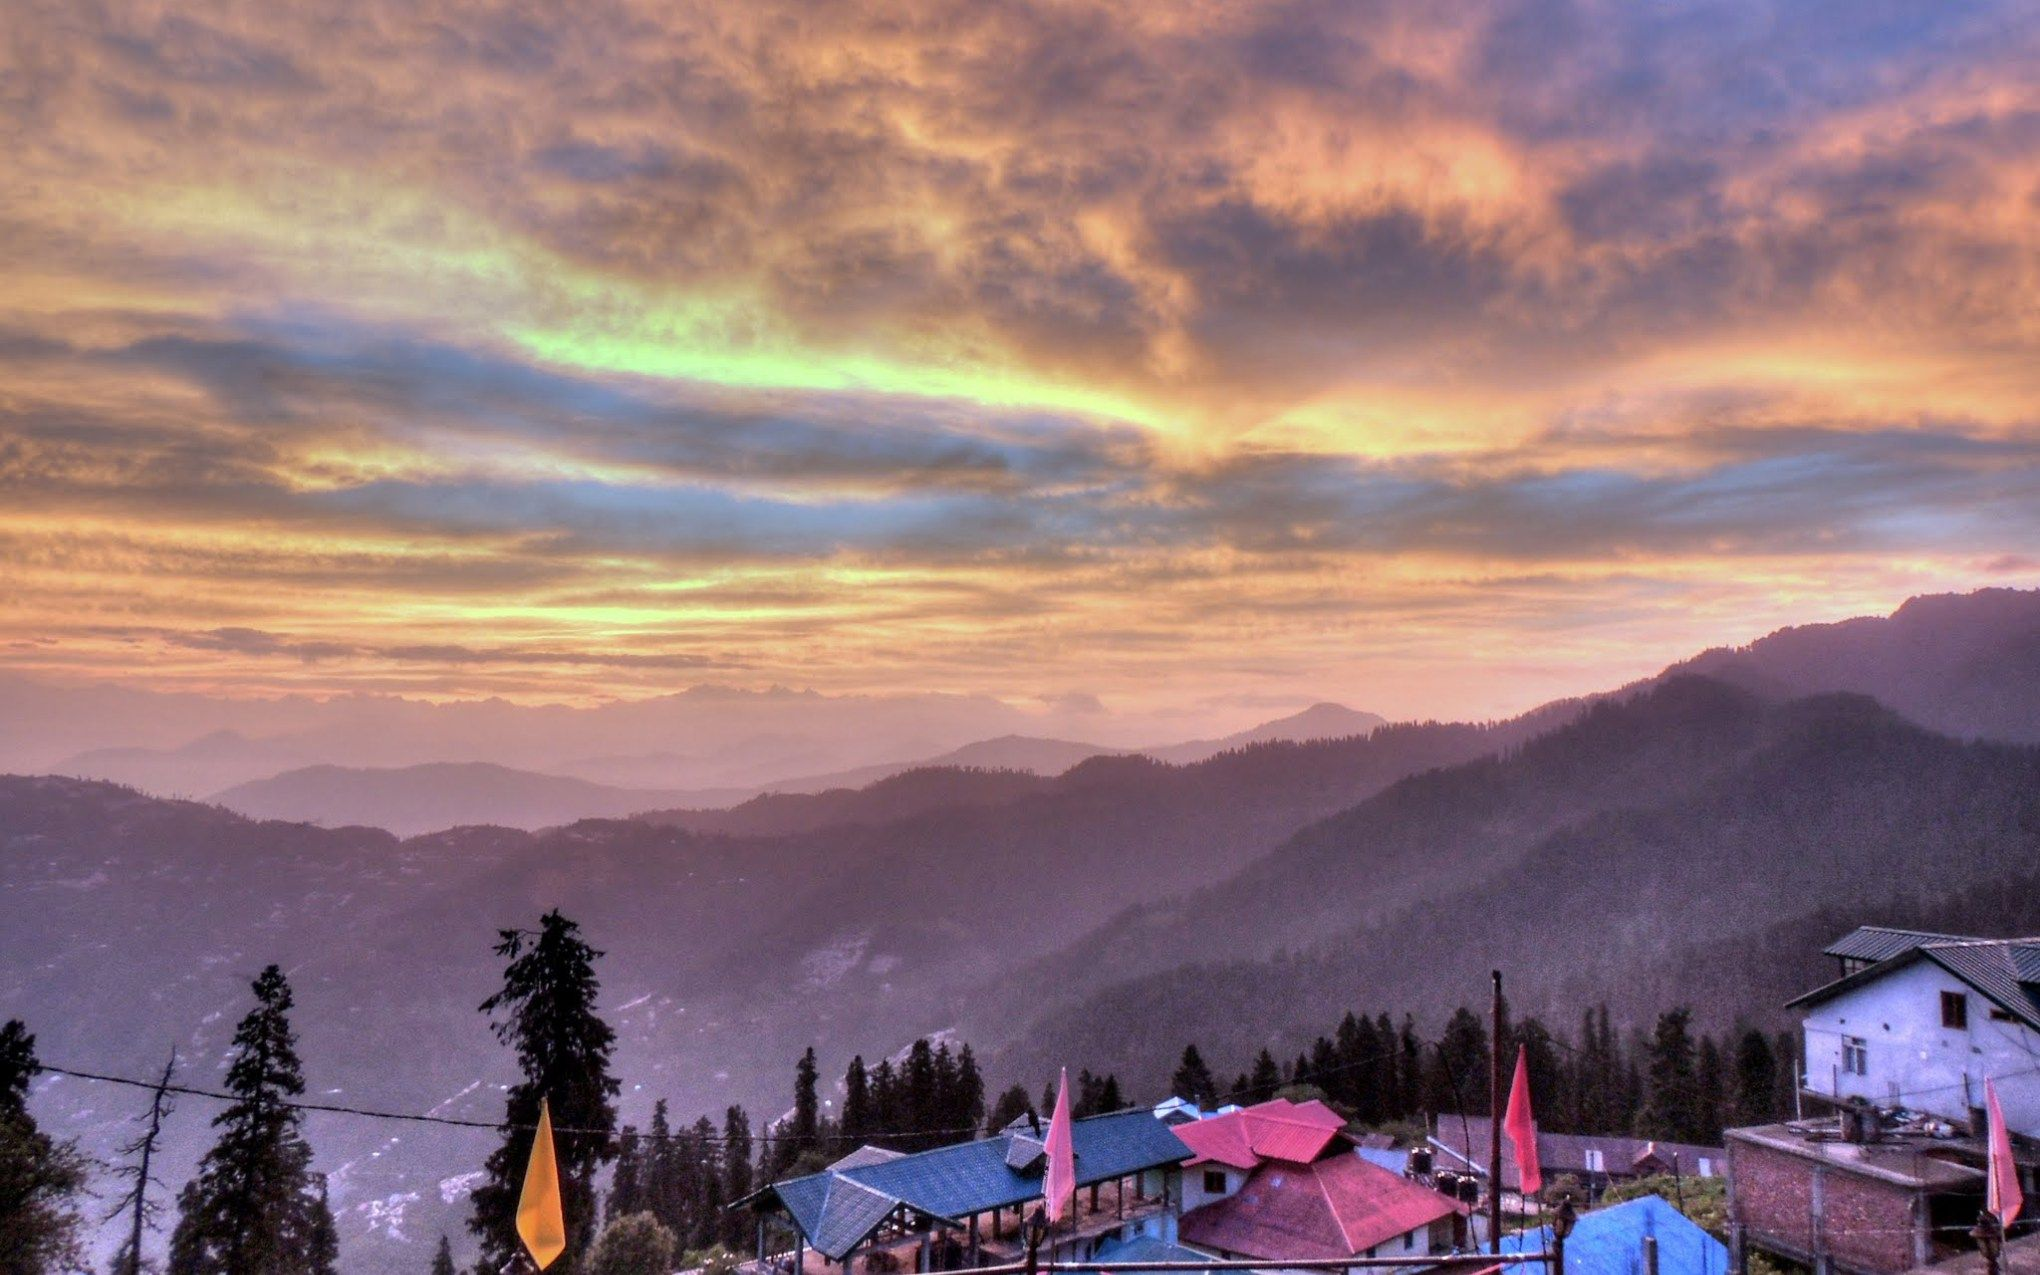 Shimla Beautiful Hill And Dramatic Sky Digital Art Photography Background Images Landscape Photography